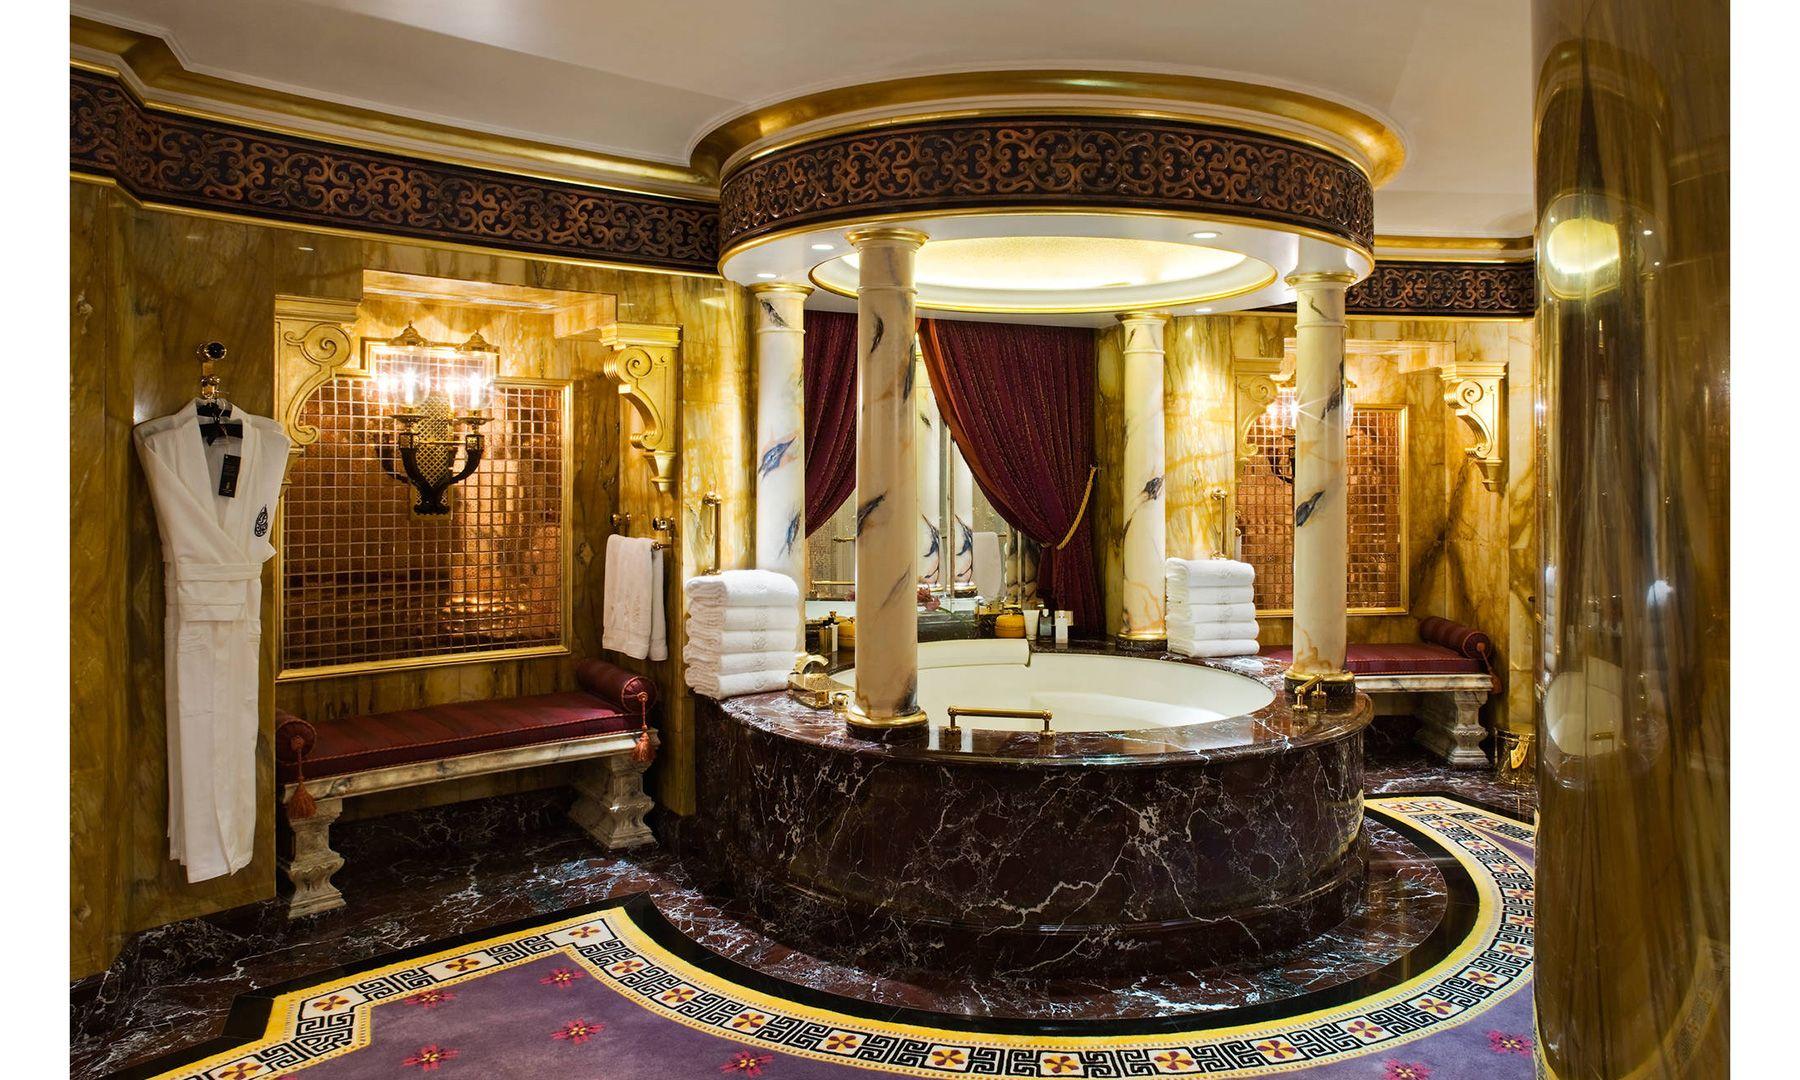 Pictures: Dubai's Most Luxurious Hotel Burj Al Arab ...